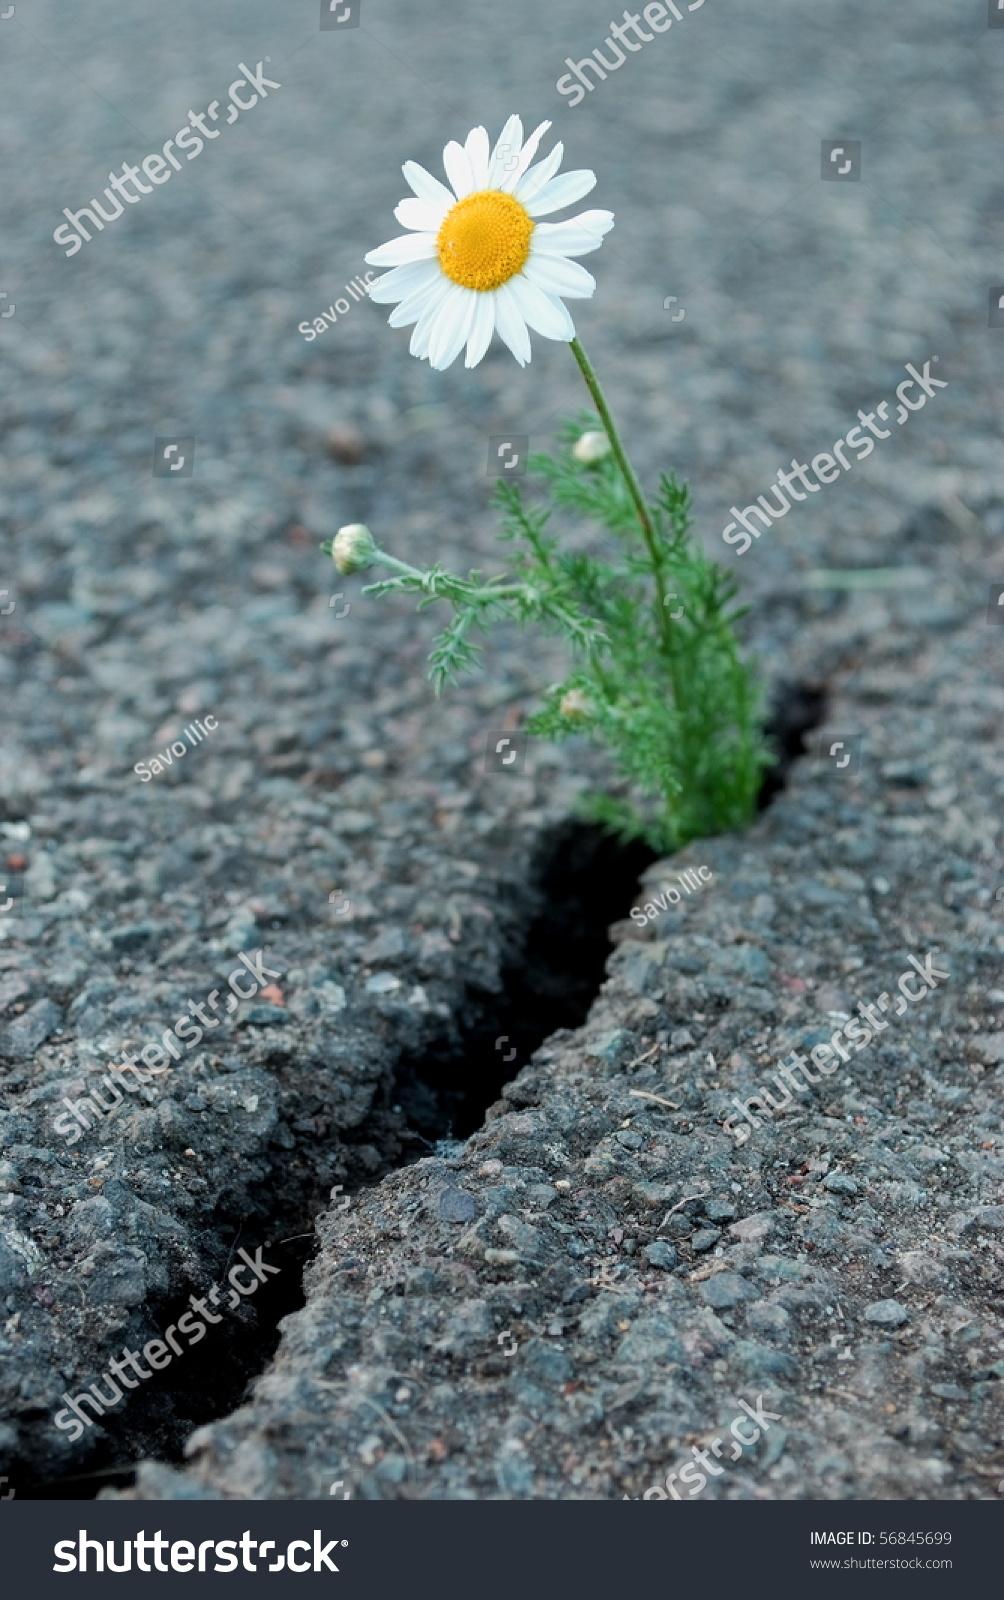 Daisy Flower Growing Cracked Asphalt Stock Photo Edit Now 56845699